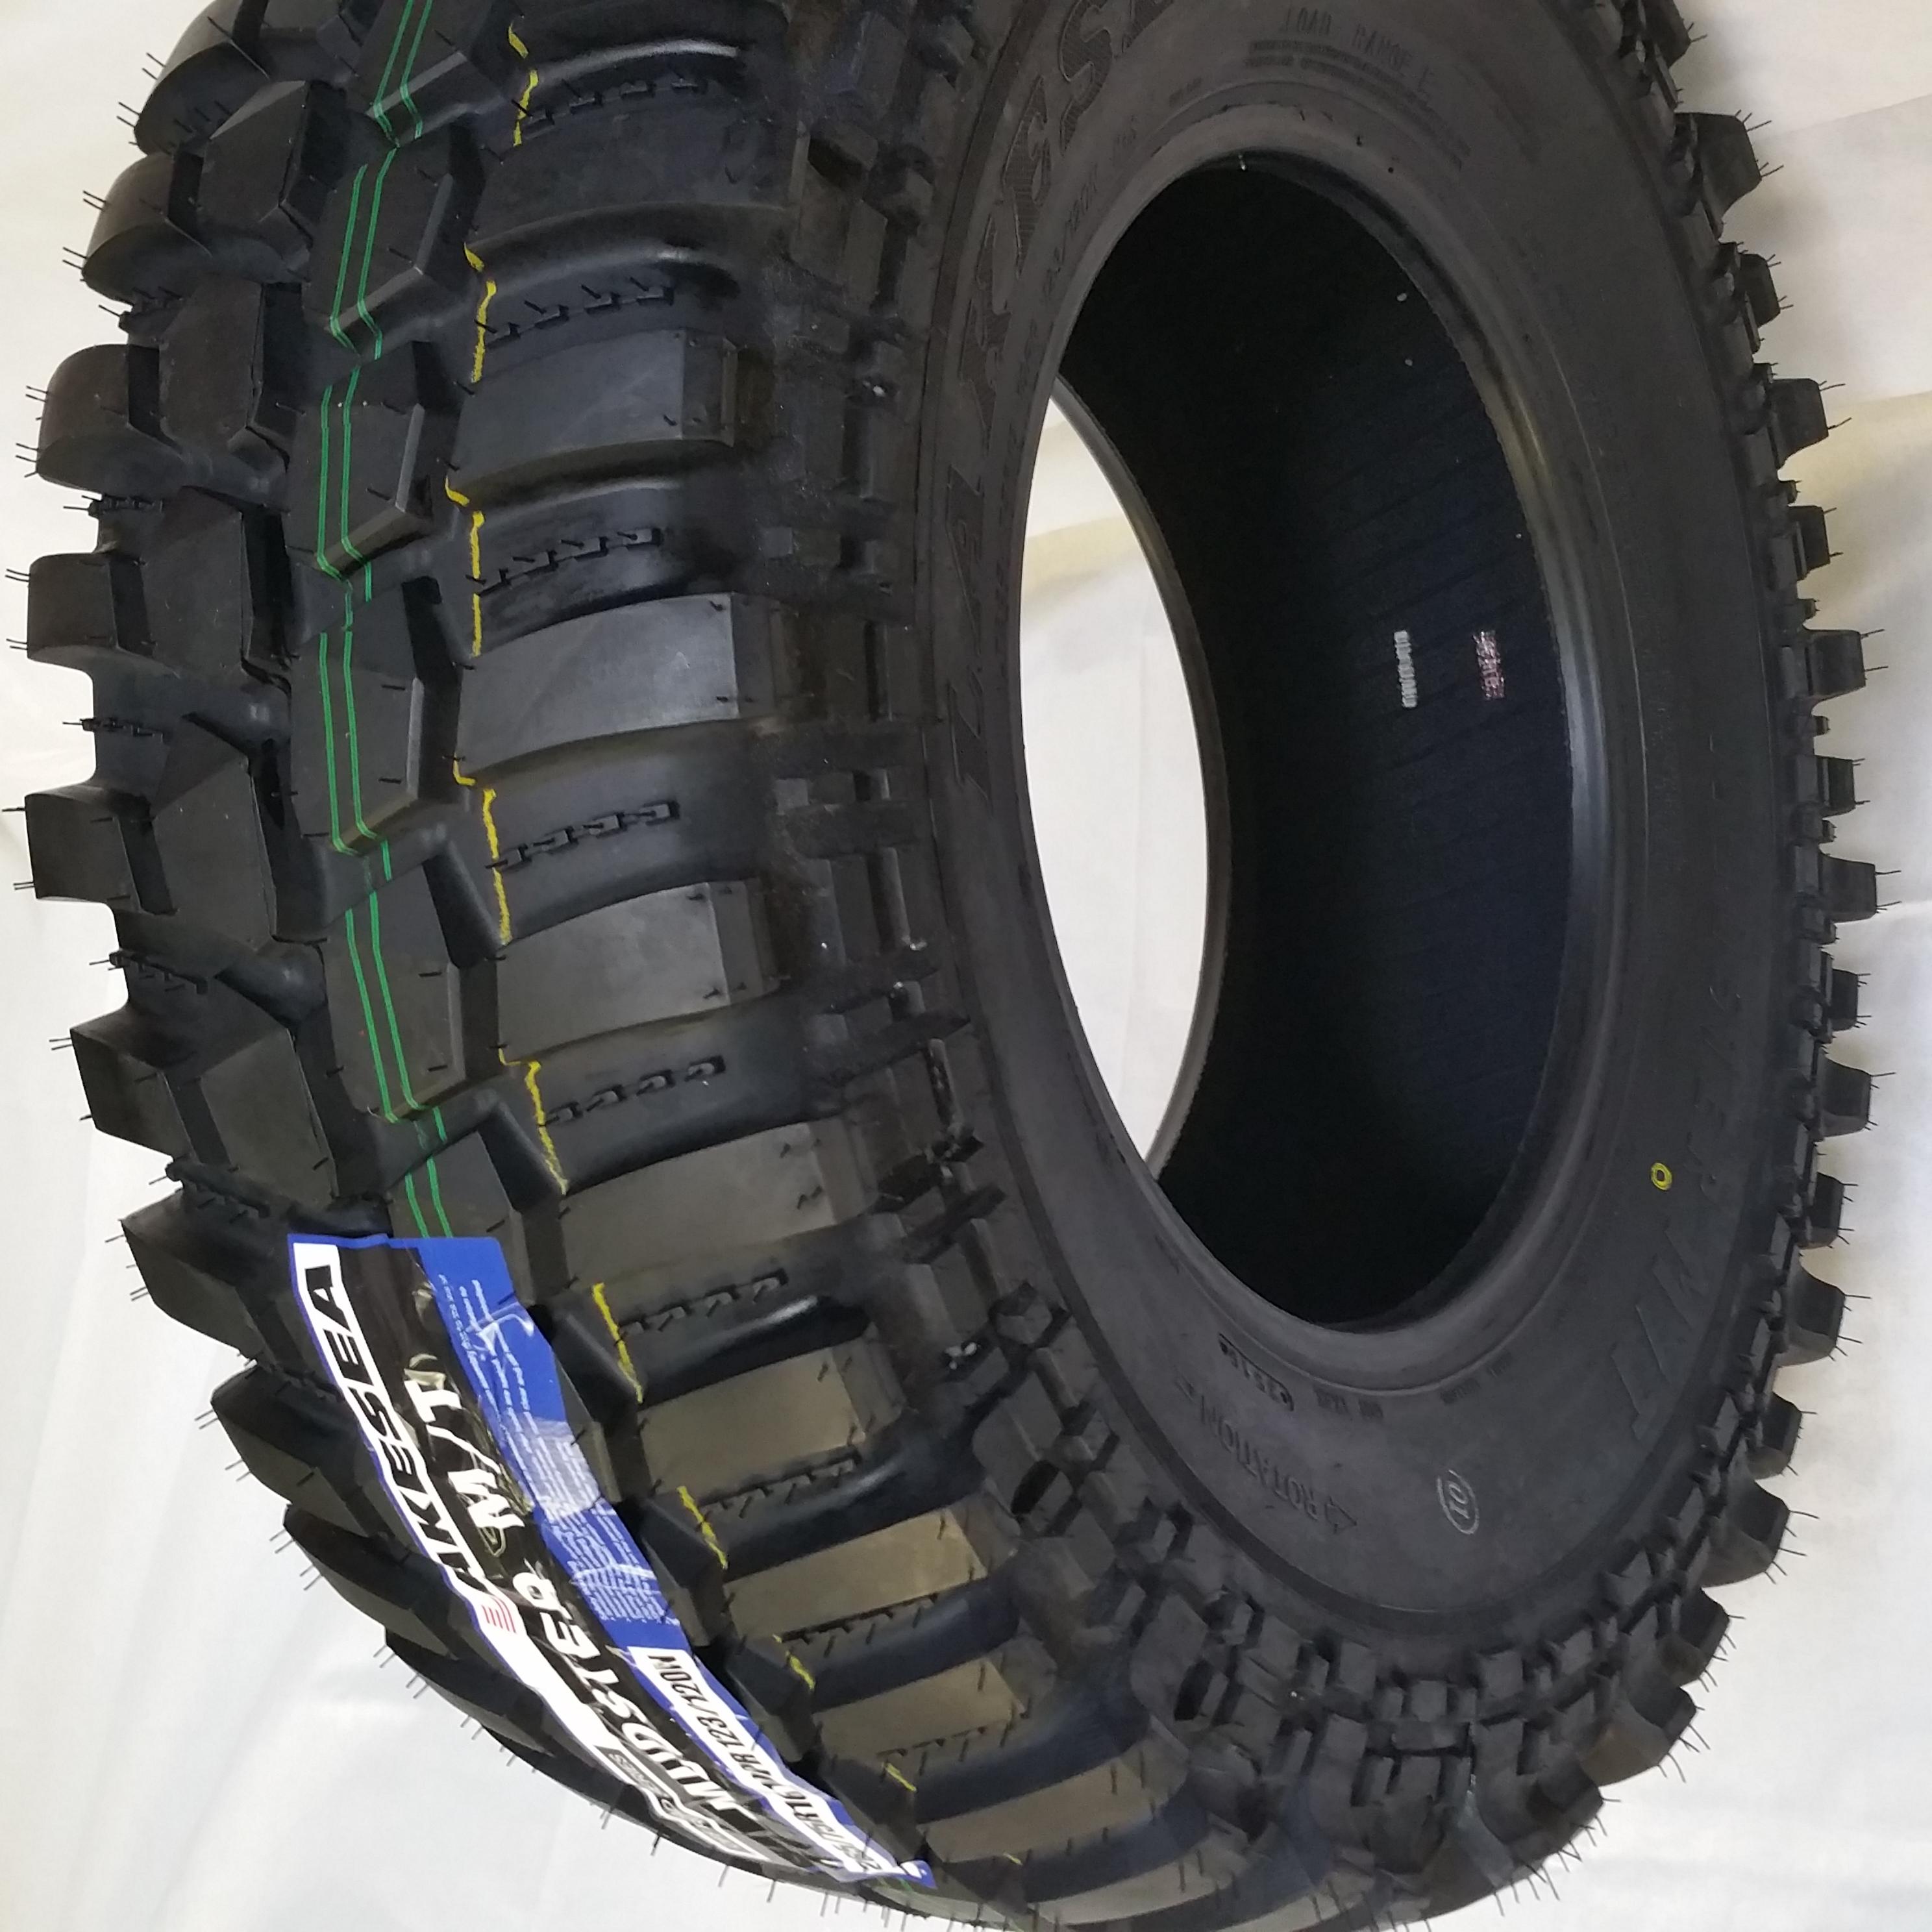 view light product jml ltd by motors used lighting truck tires japan